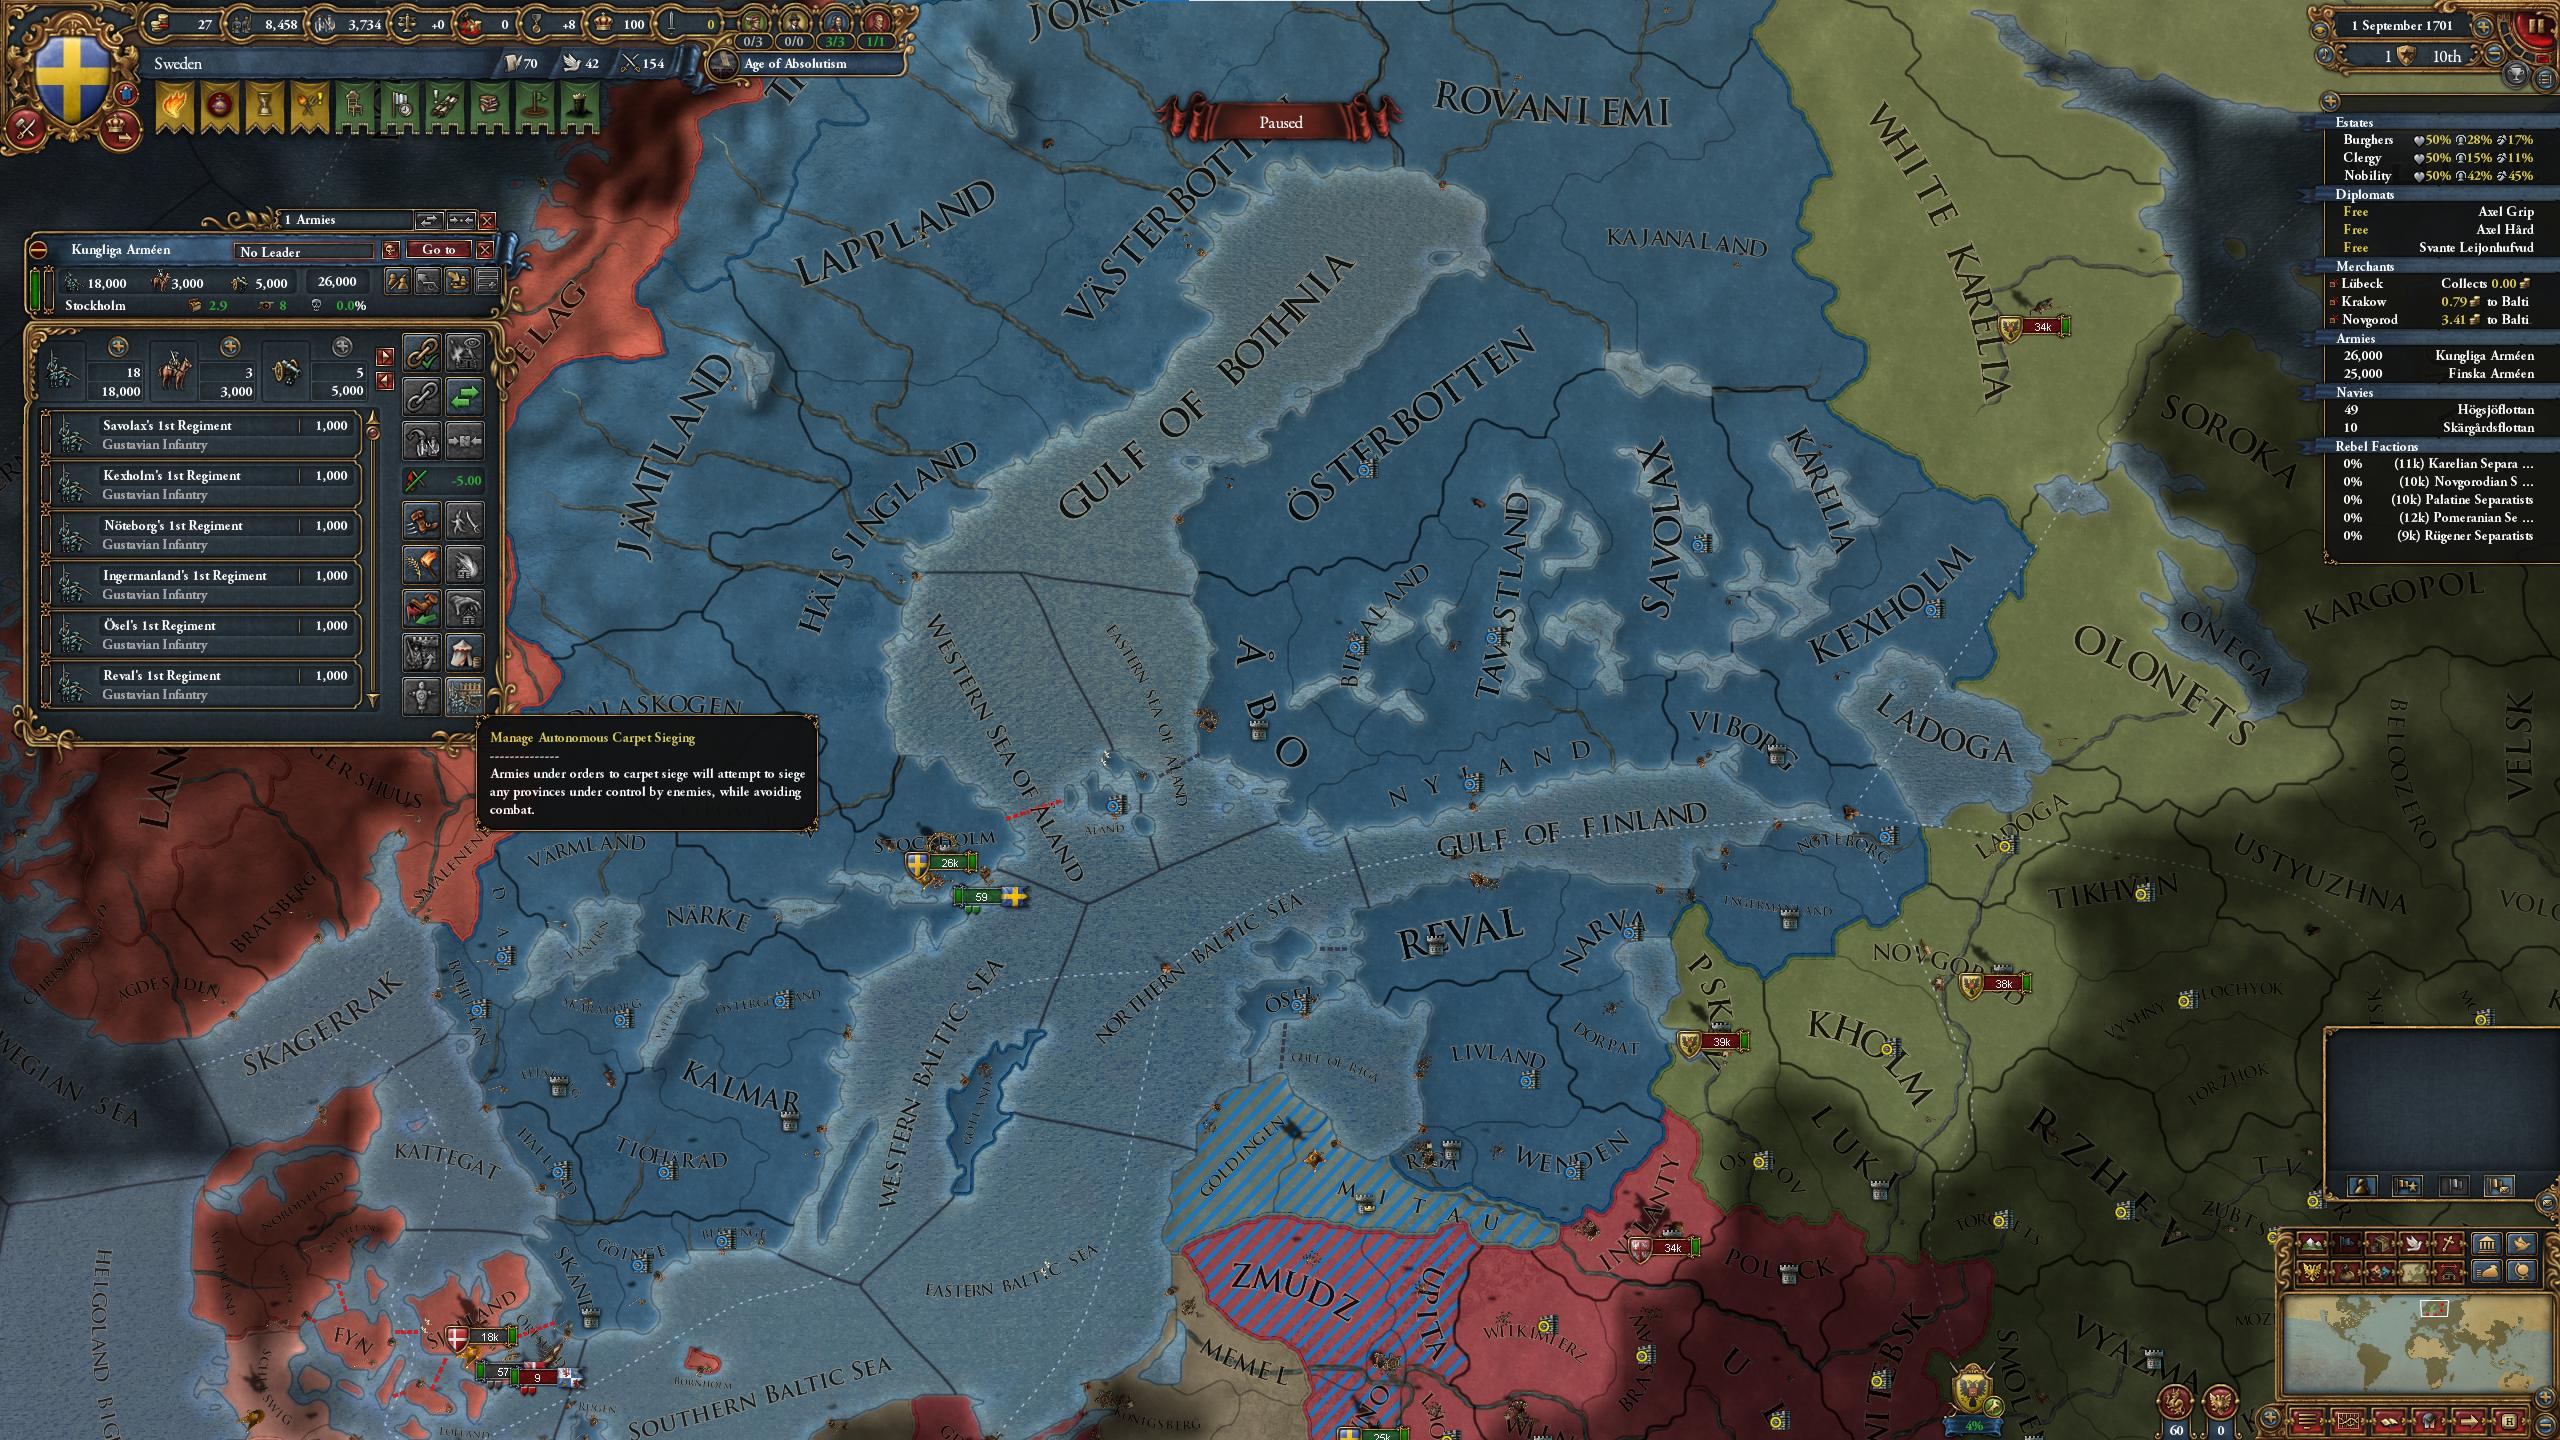 Europa Universalis IV: Leviathan | ROW (20ad8c9a-32ad-49ee-a968-43ff21399c5b)